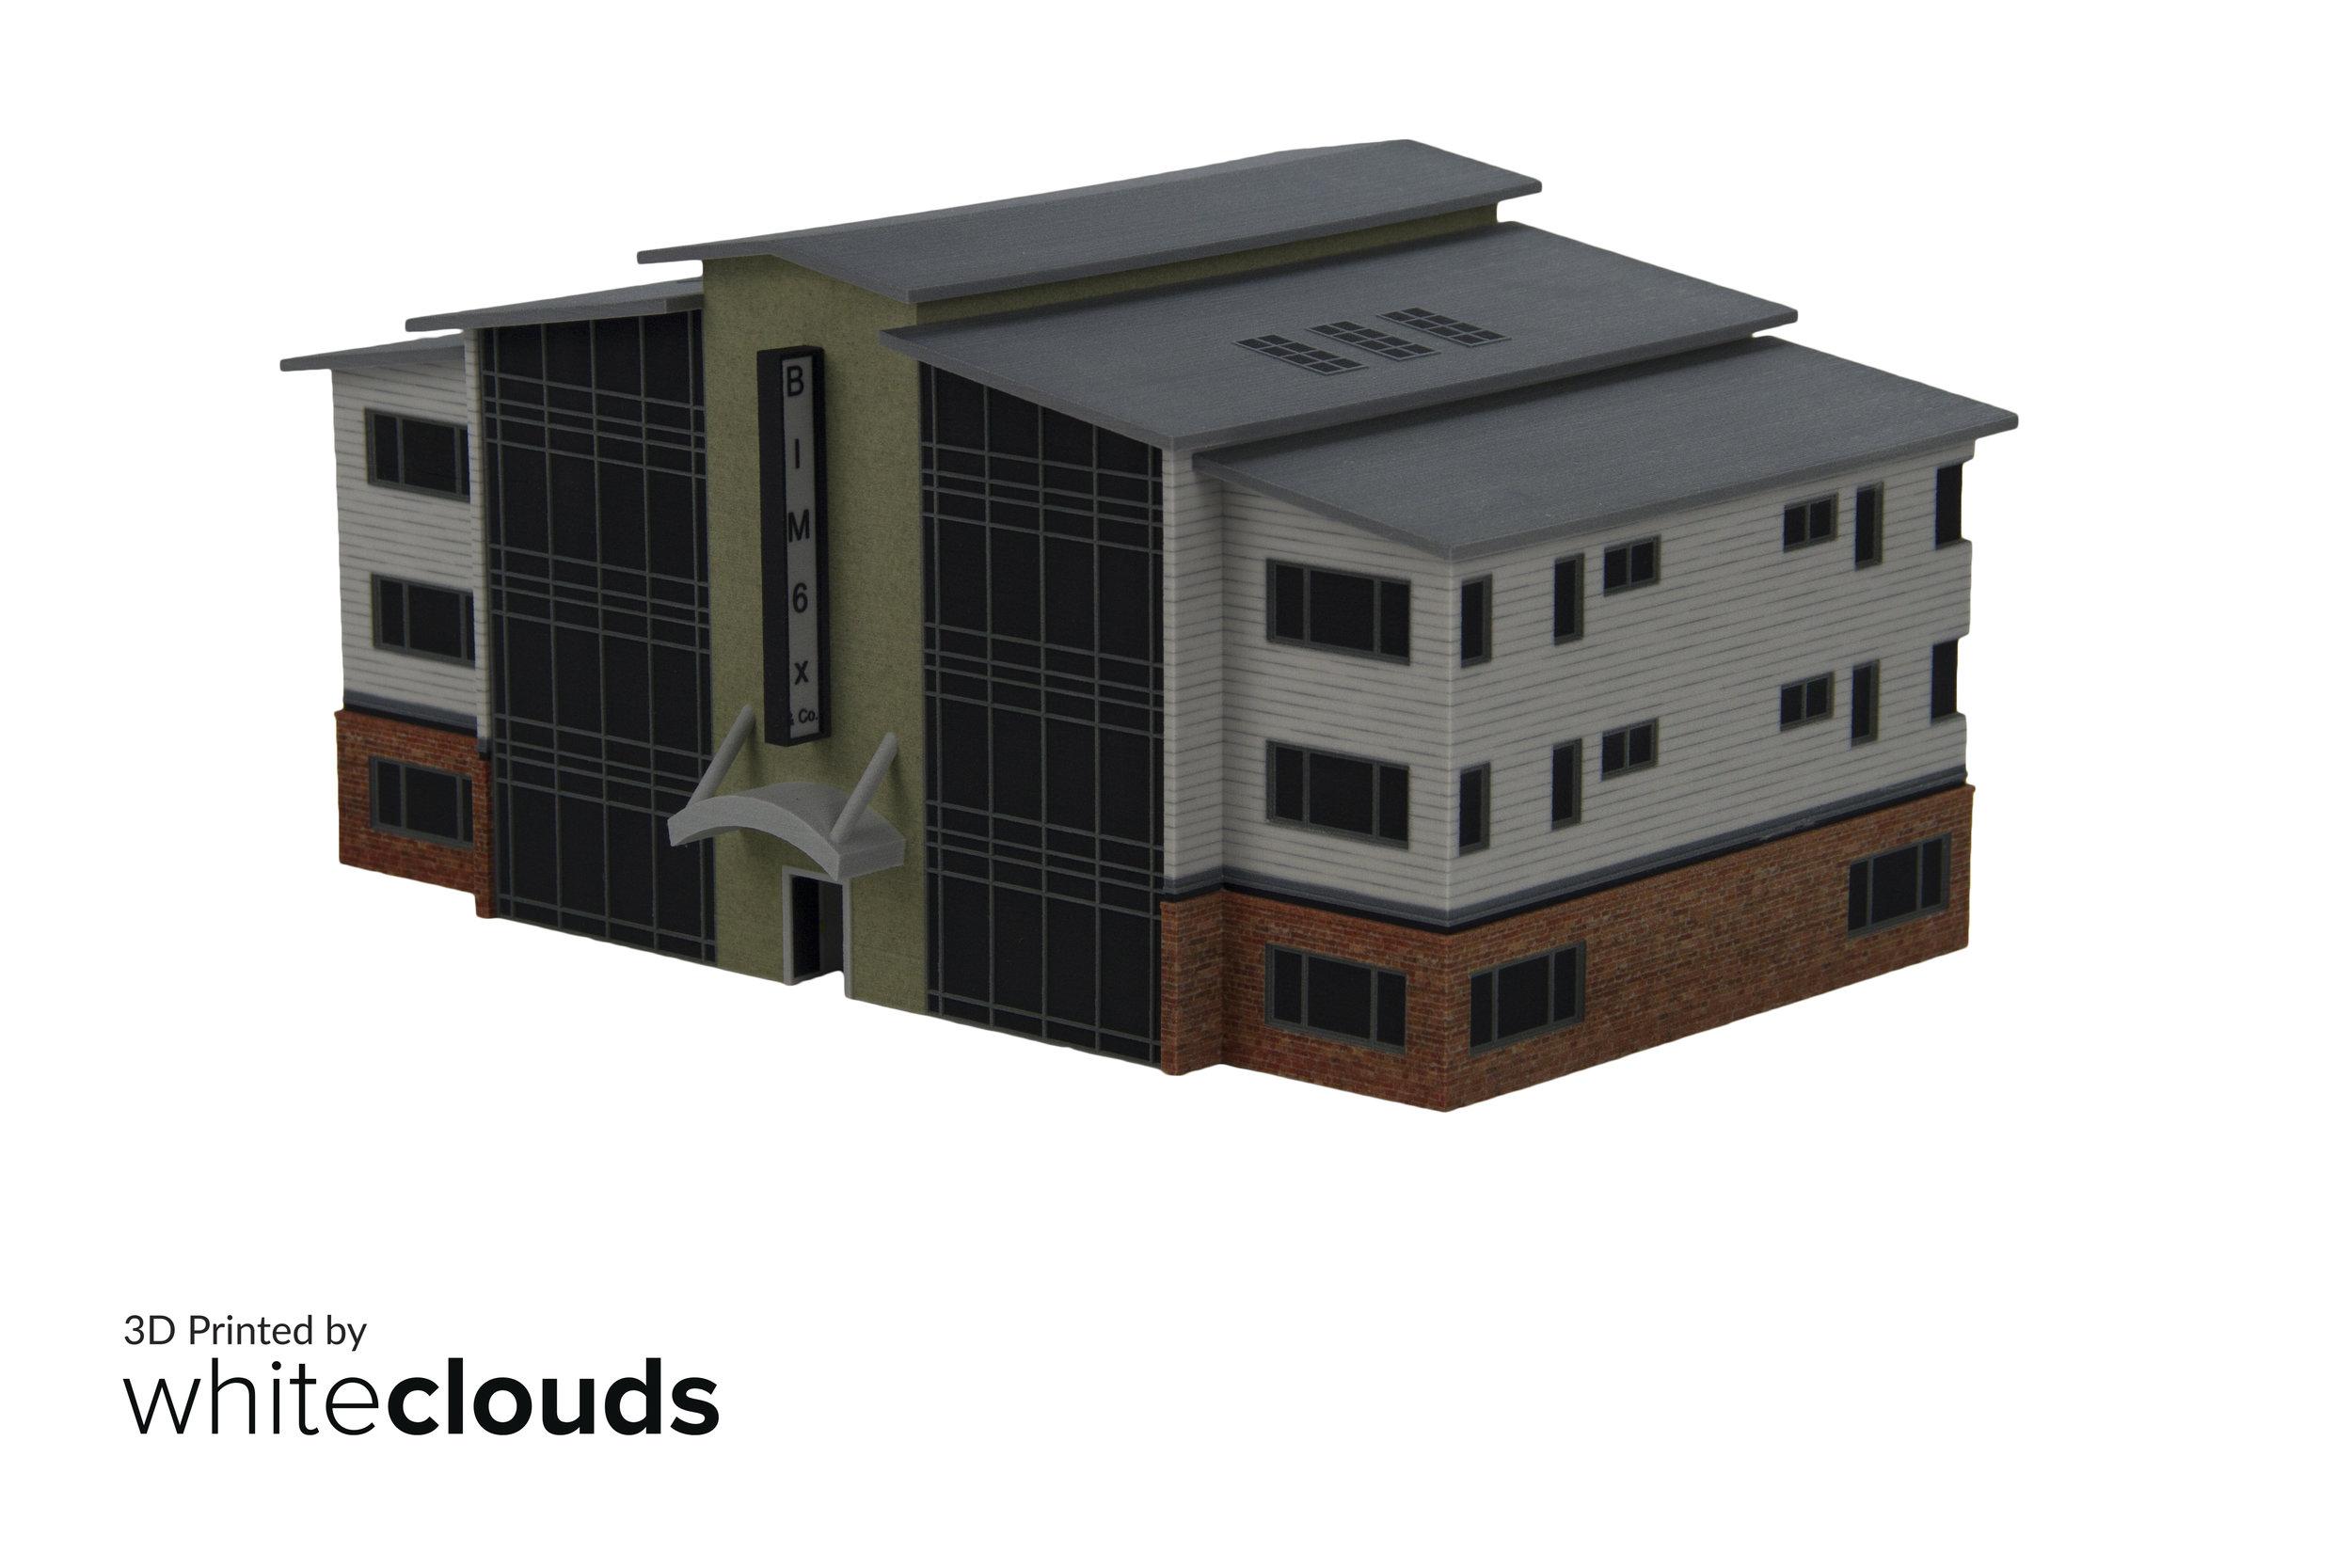 3D-Printed-WhiteCloud-BIM6x-2-Architecture-BIM6x-CR2-2.jpg